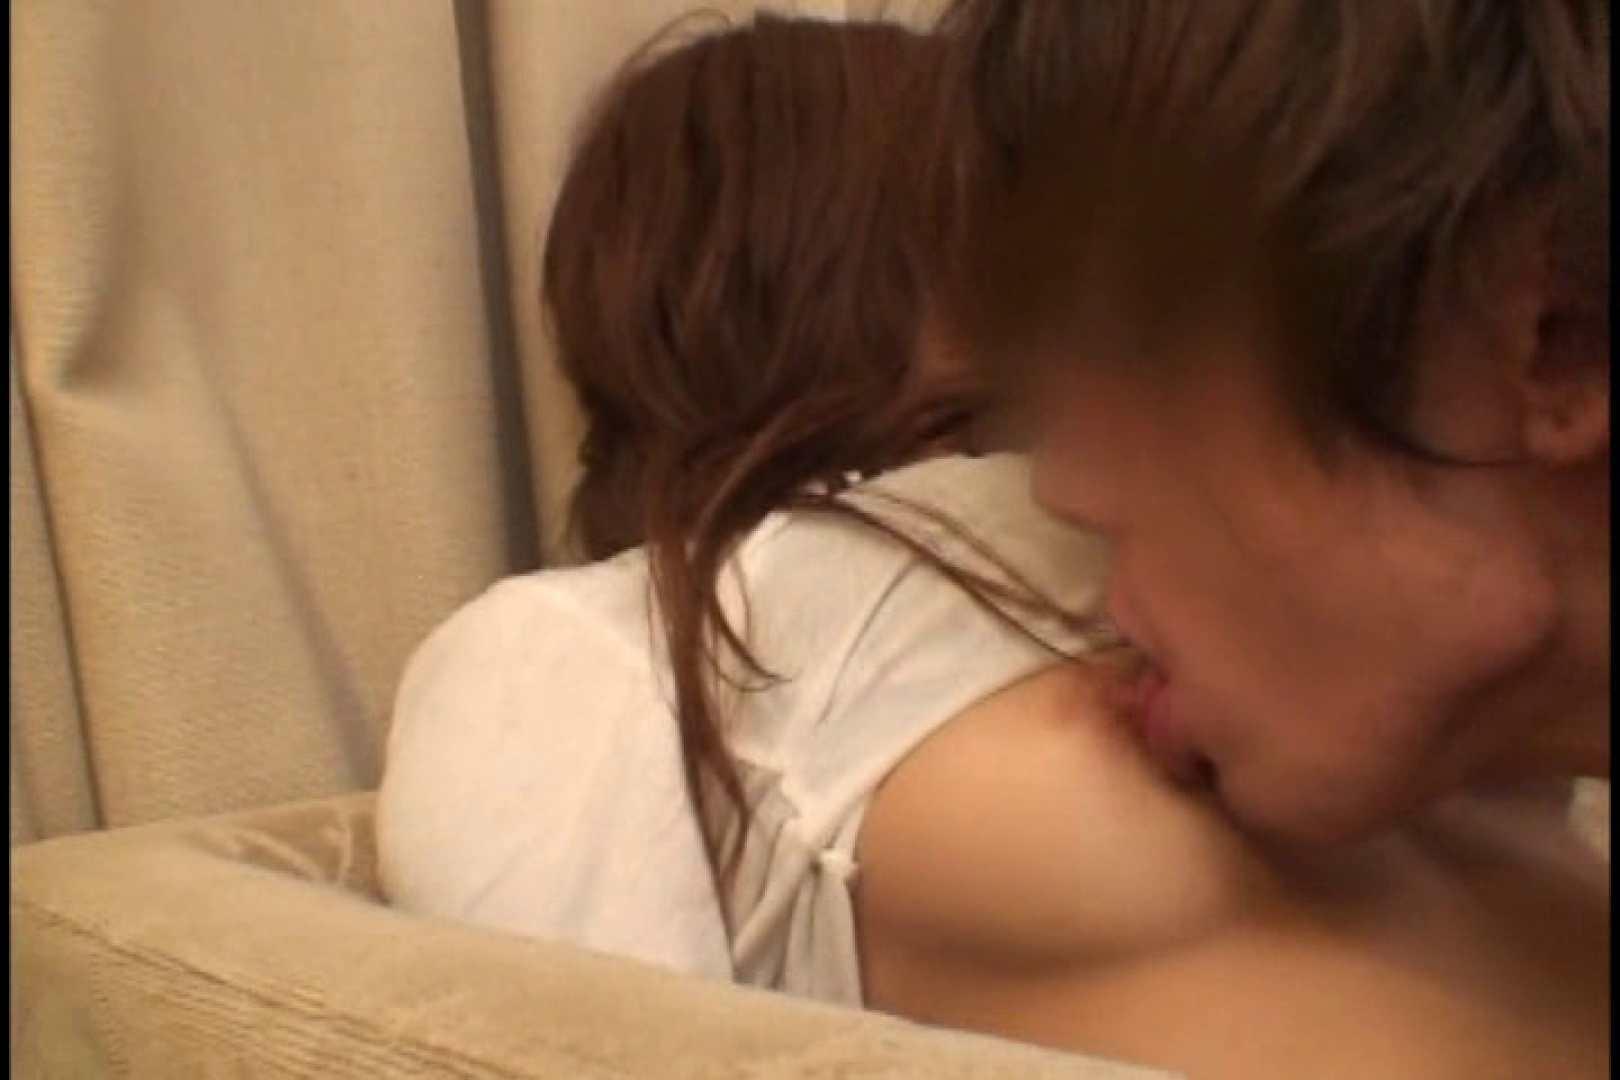 JDハンター全国ツアー vol.013 後編 女子大生のエロ動画 | 0  106PIX 35